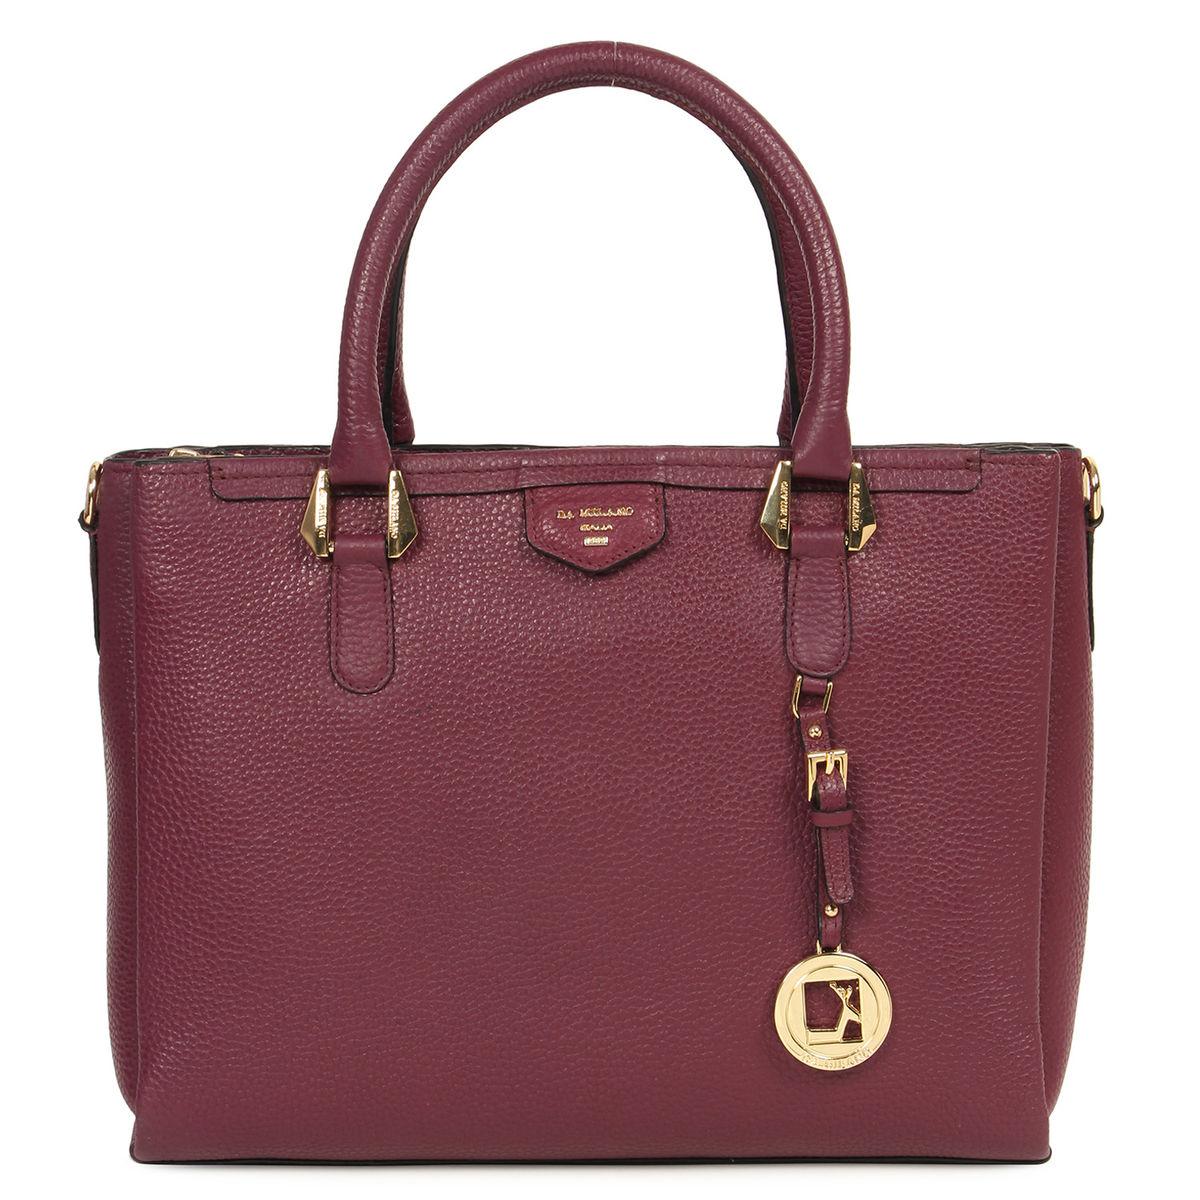 Da Milano Purple Top Handle Bag Lb 4218spurplewax